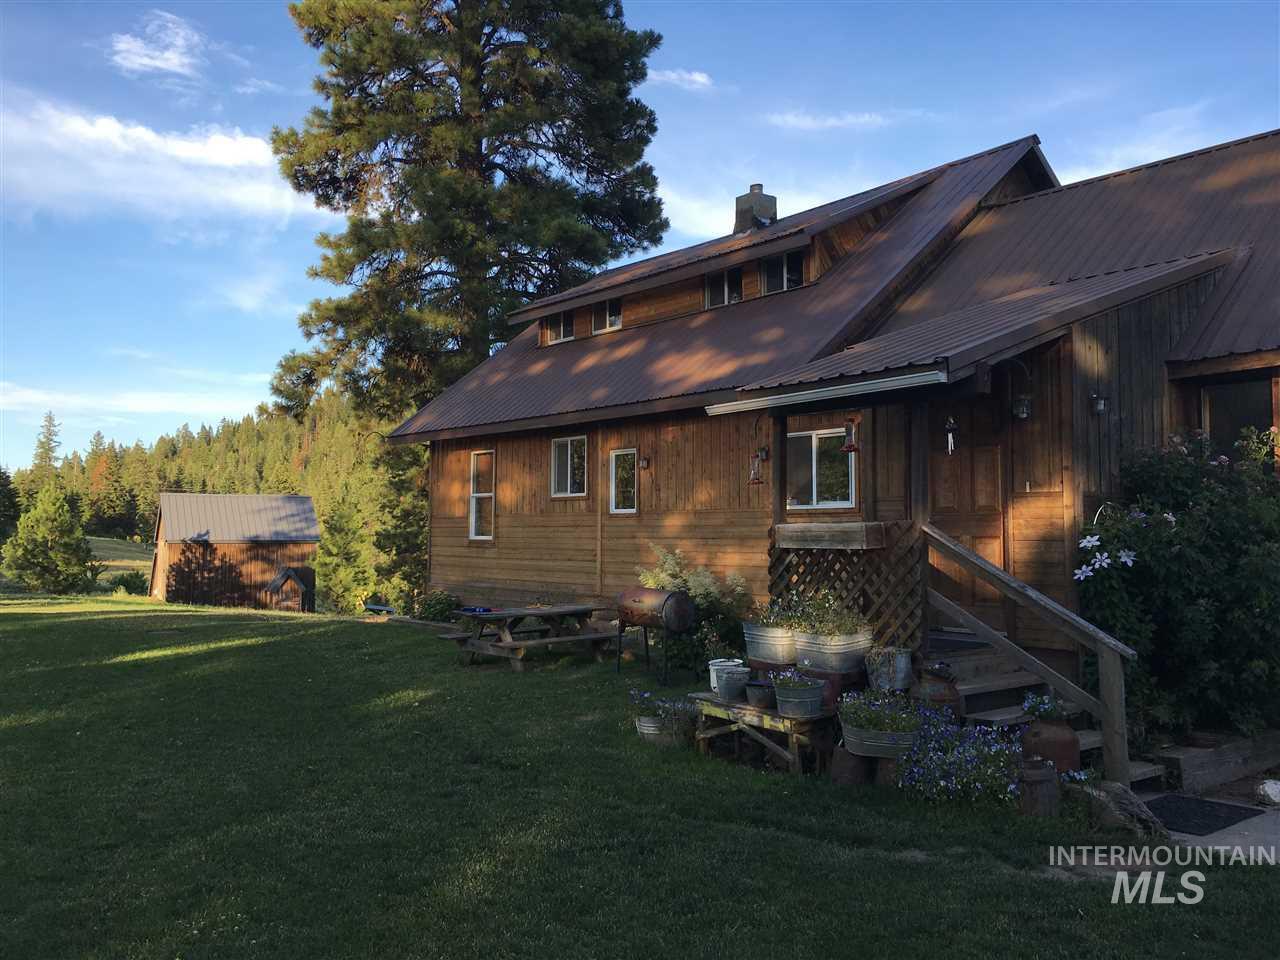 Single Family Home for Sale at 470 Haynes Lane Plummer, Idaho 83851